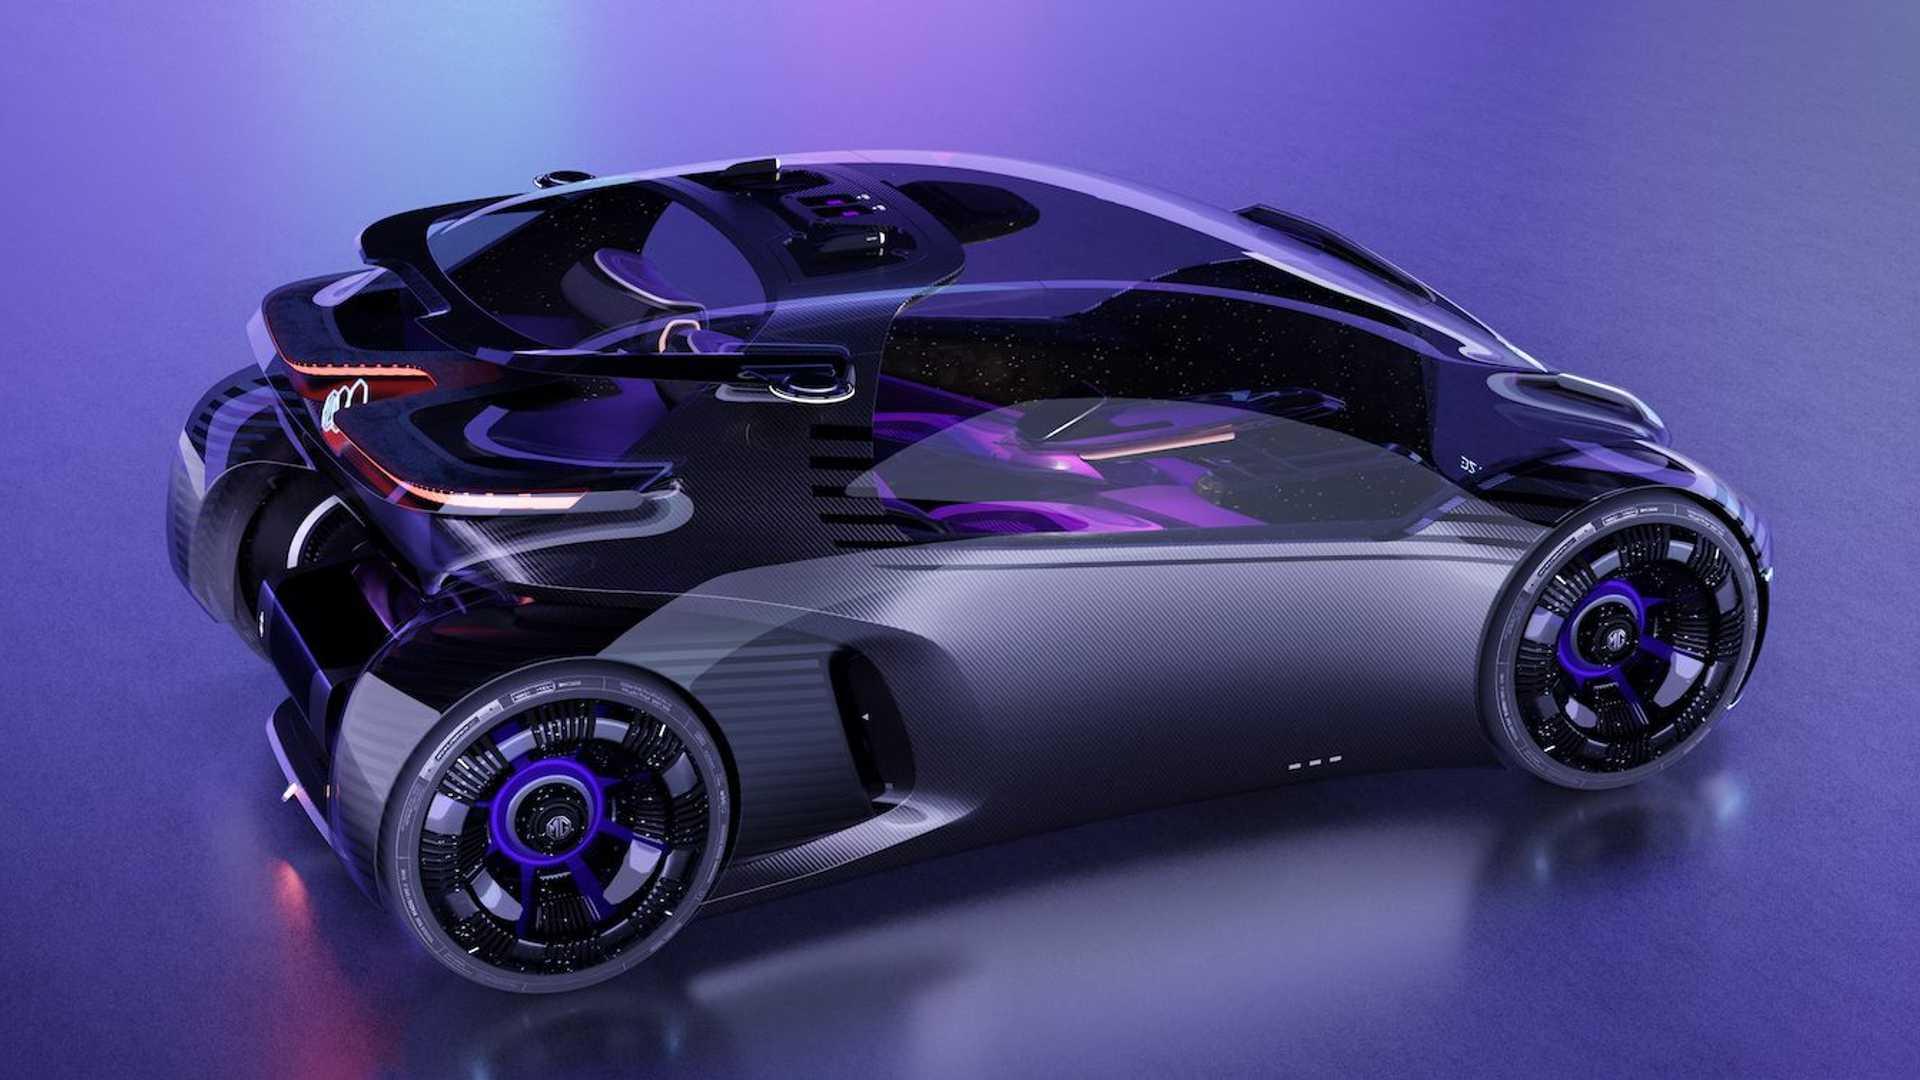 https://cdn.motor1.com/images/mgl/B7GYM/s6/mg-maze-il-concept-elettrico-del-futuro.jpg